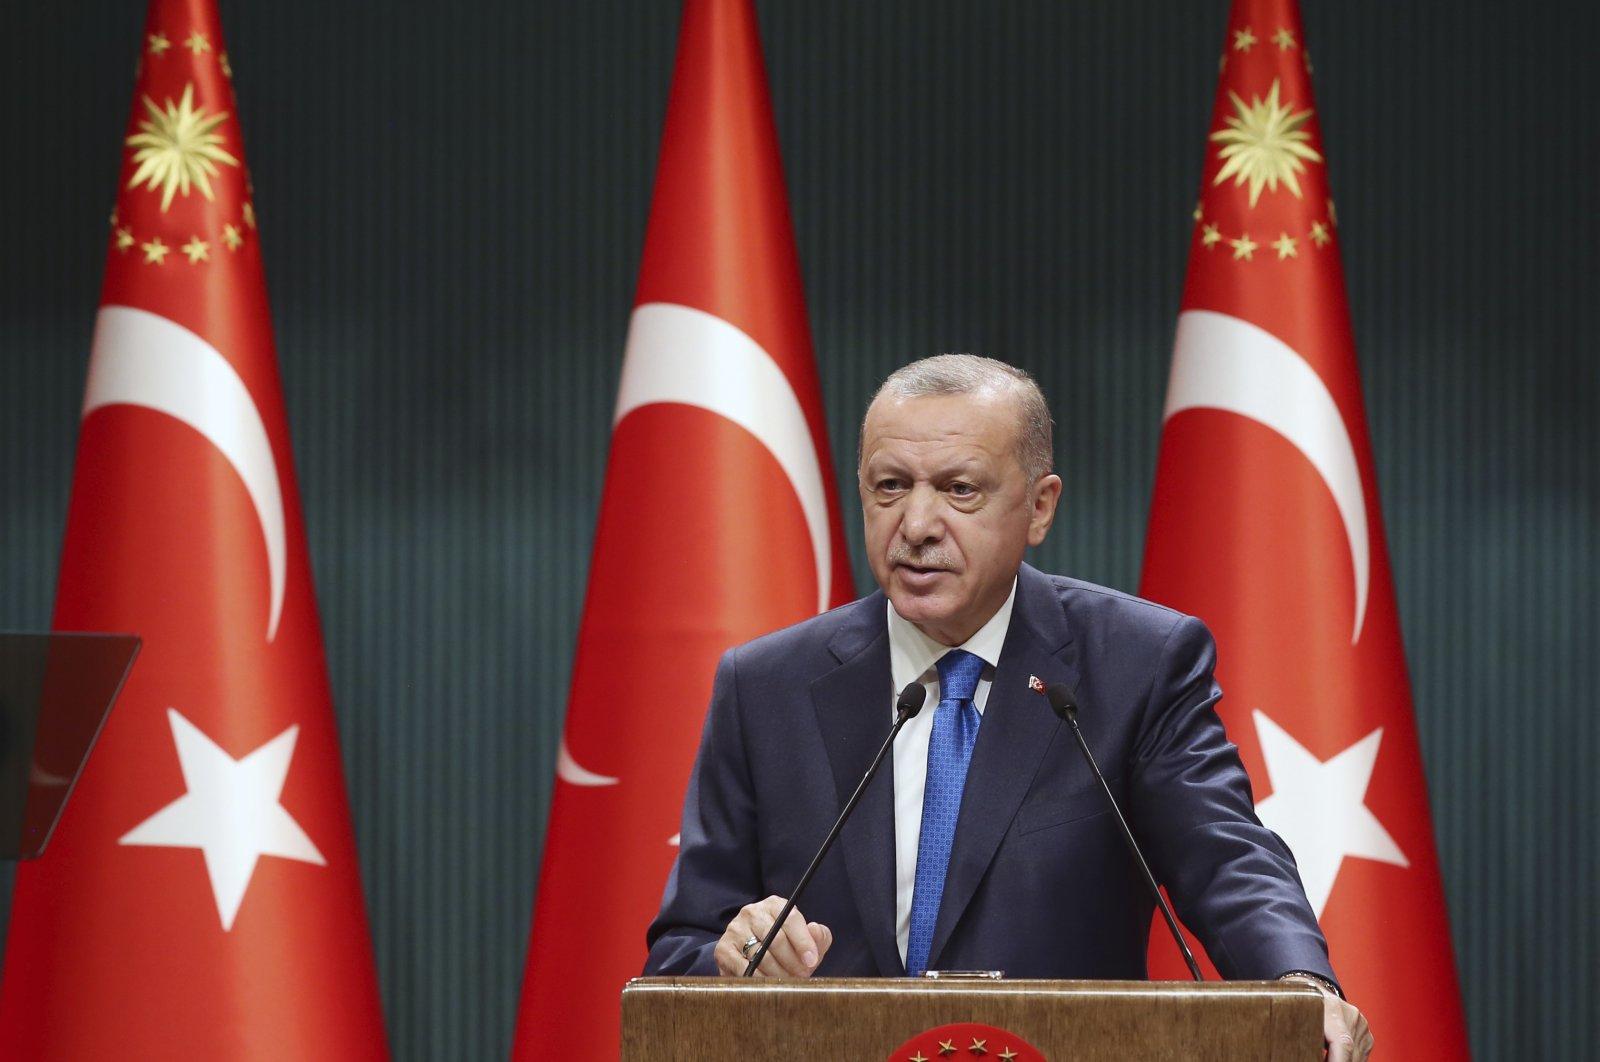 President Recep Tayyip Erdoğan speaks after a Cabinet meeting in the capital Ankara, Sept. 7, 2020. (AP Photo)